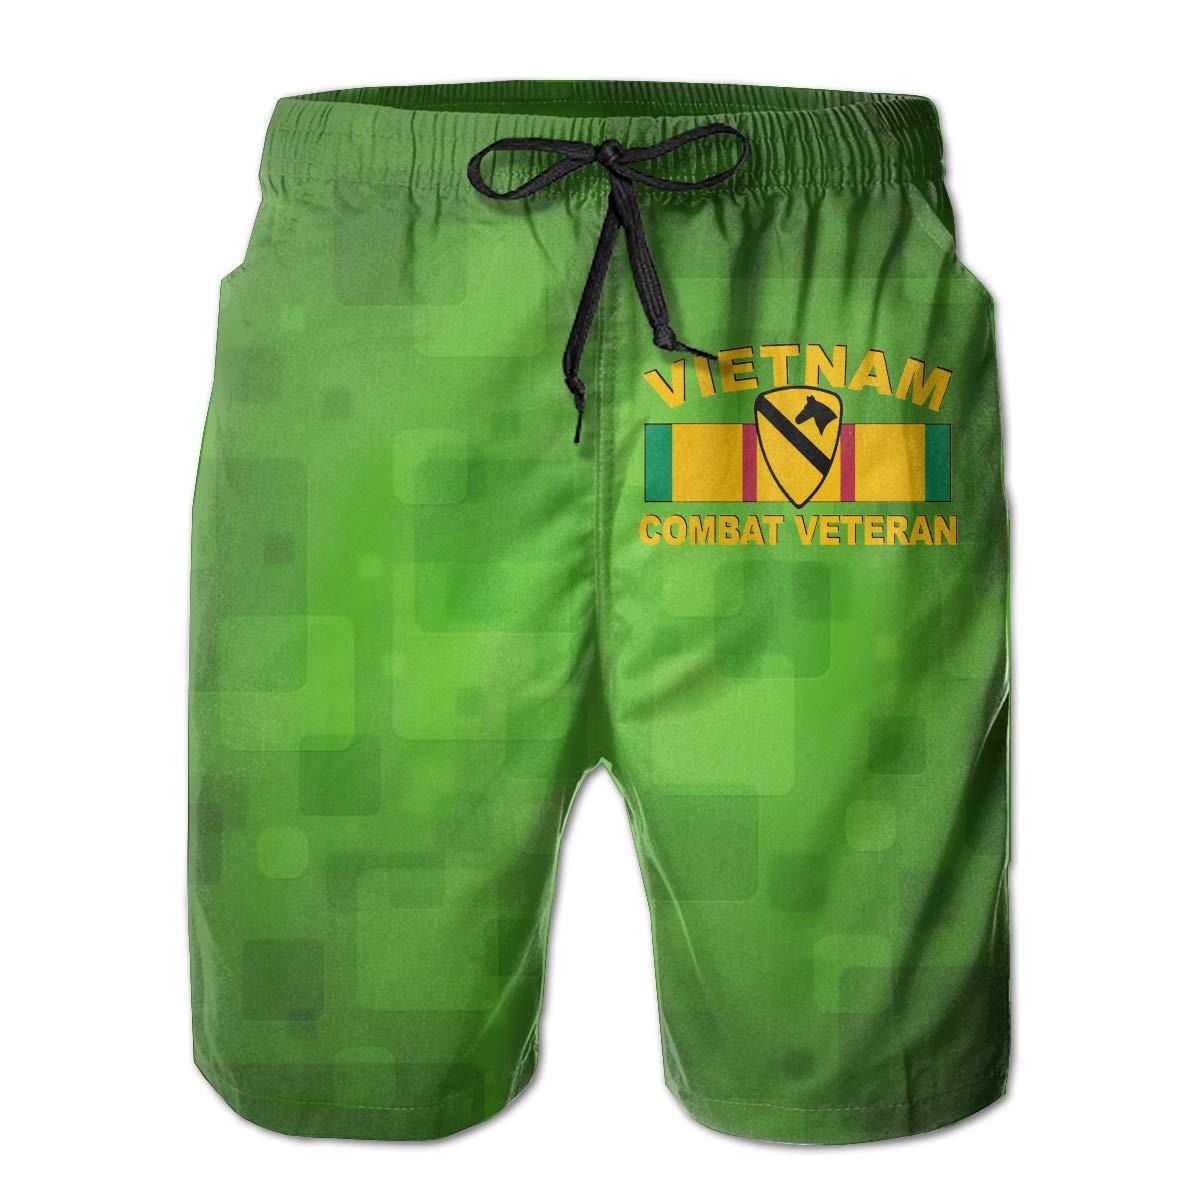 Army 1st Cavalry Division Veteran 3D Print Mens Beach Shorts Swim Trunks Workout Shorts Summer Shorts